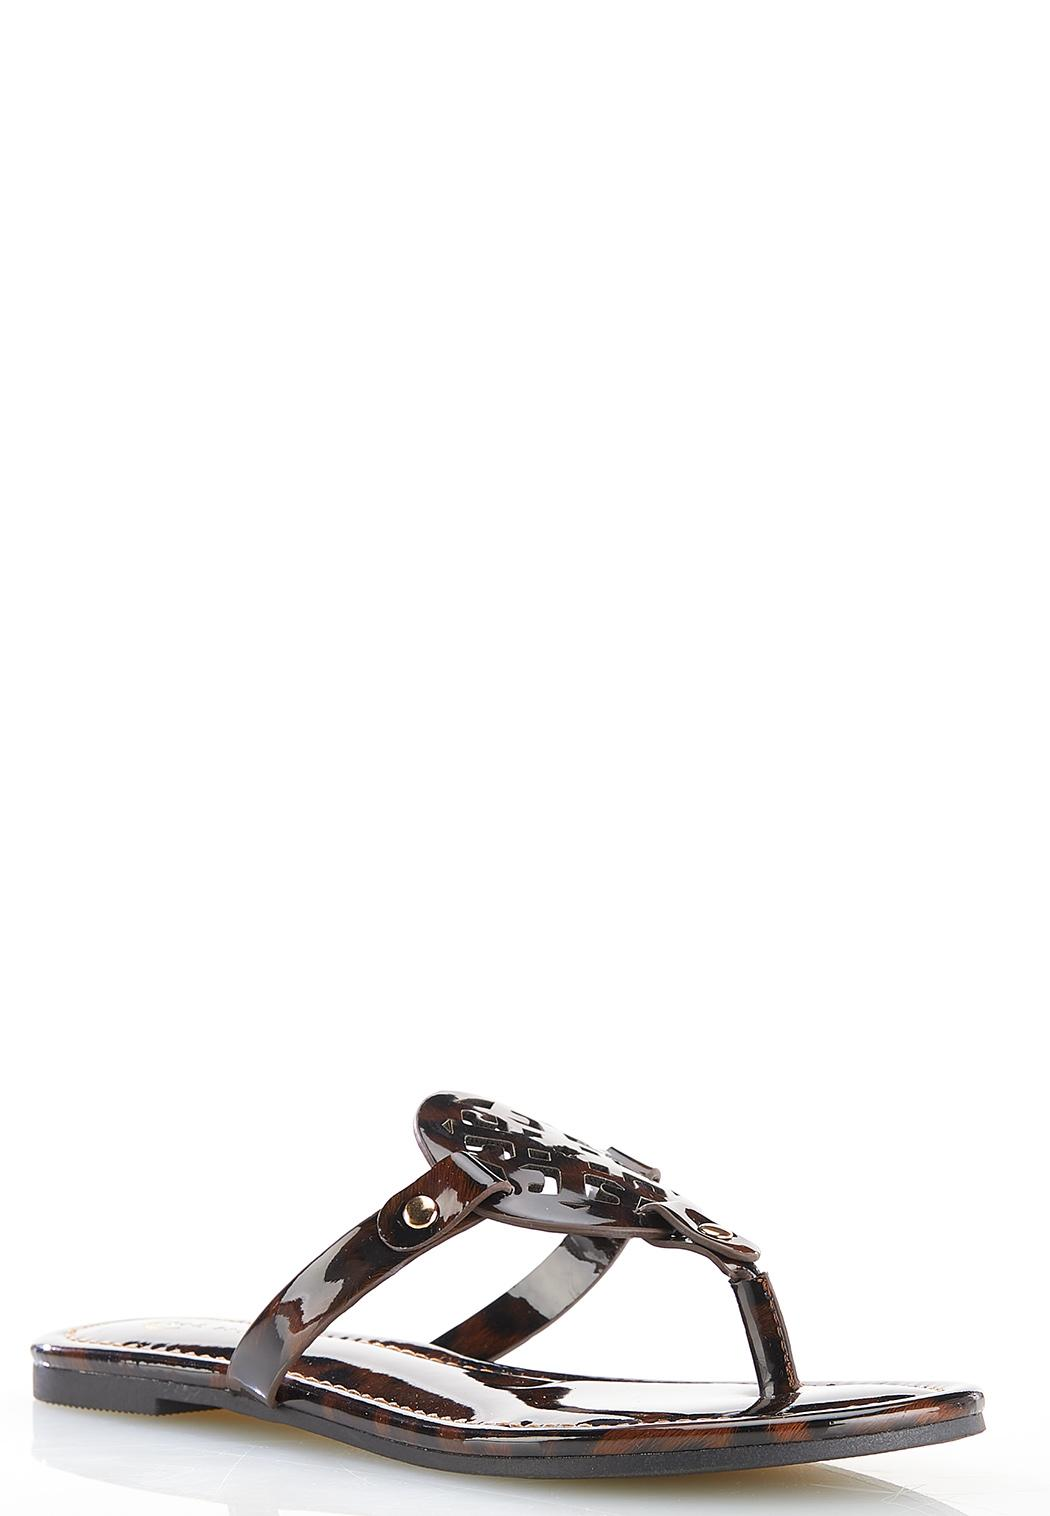 Leopard Medallion Sandals